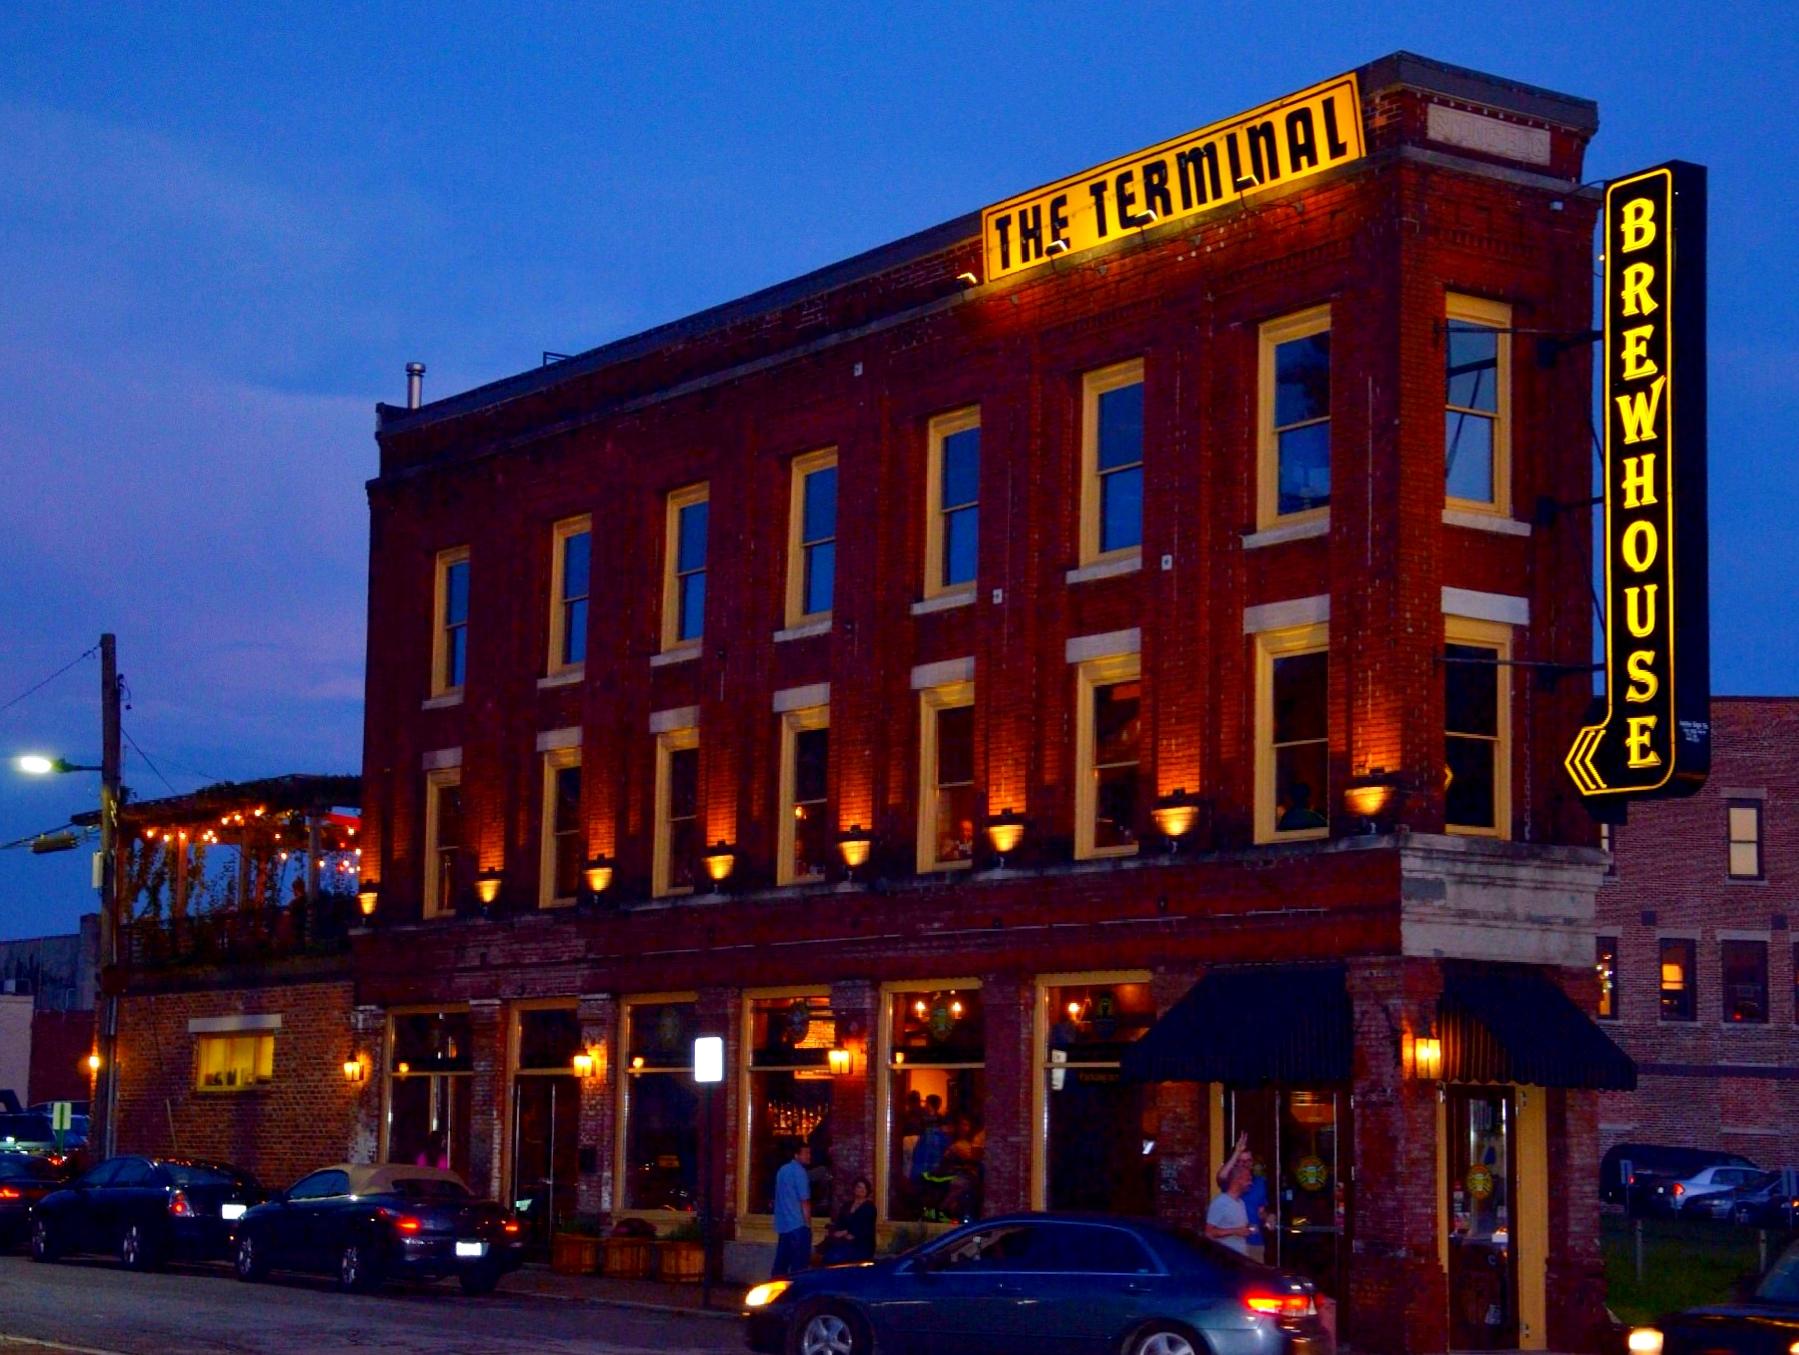 Top Wallpaper Music Food - music-food-black-Brick-sign-yellow-bar-night-fun-gold-restaurant-evening-flickr-Tennessee-patio-saturdaynight-drinks-marketstreet-nite-redbrick-chattanoogatn-outdoorcafe-nightspot-terminalbrewhouse-971616  Snapshot_151356.jpg